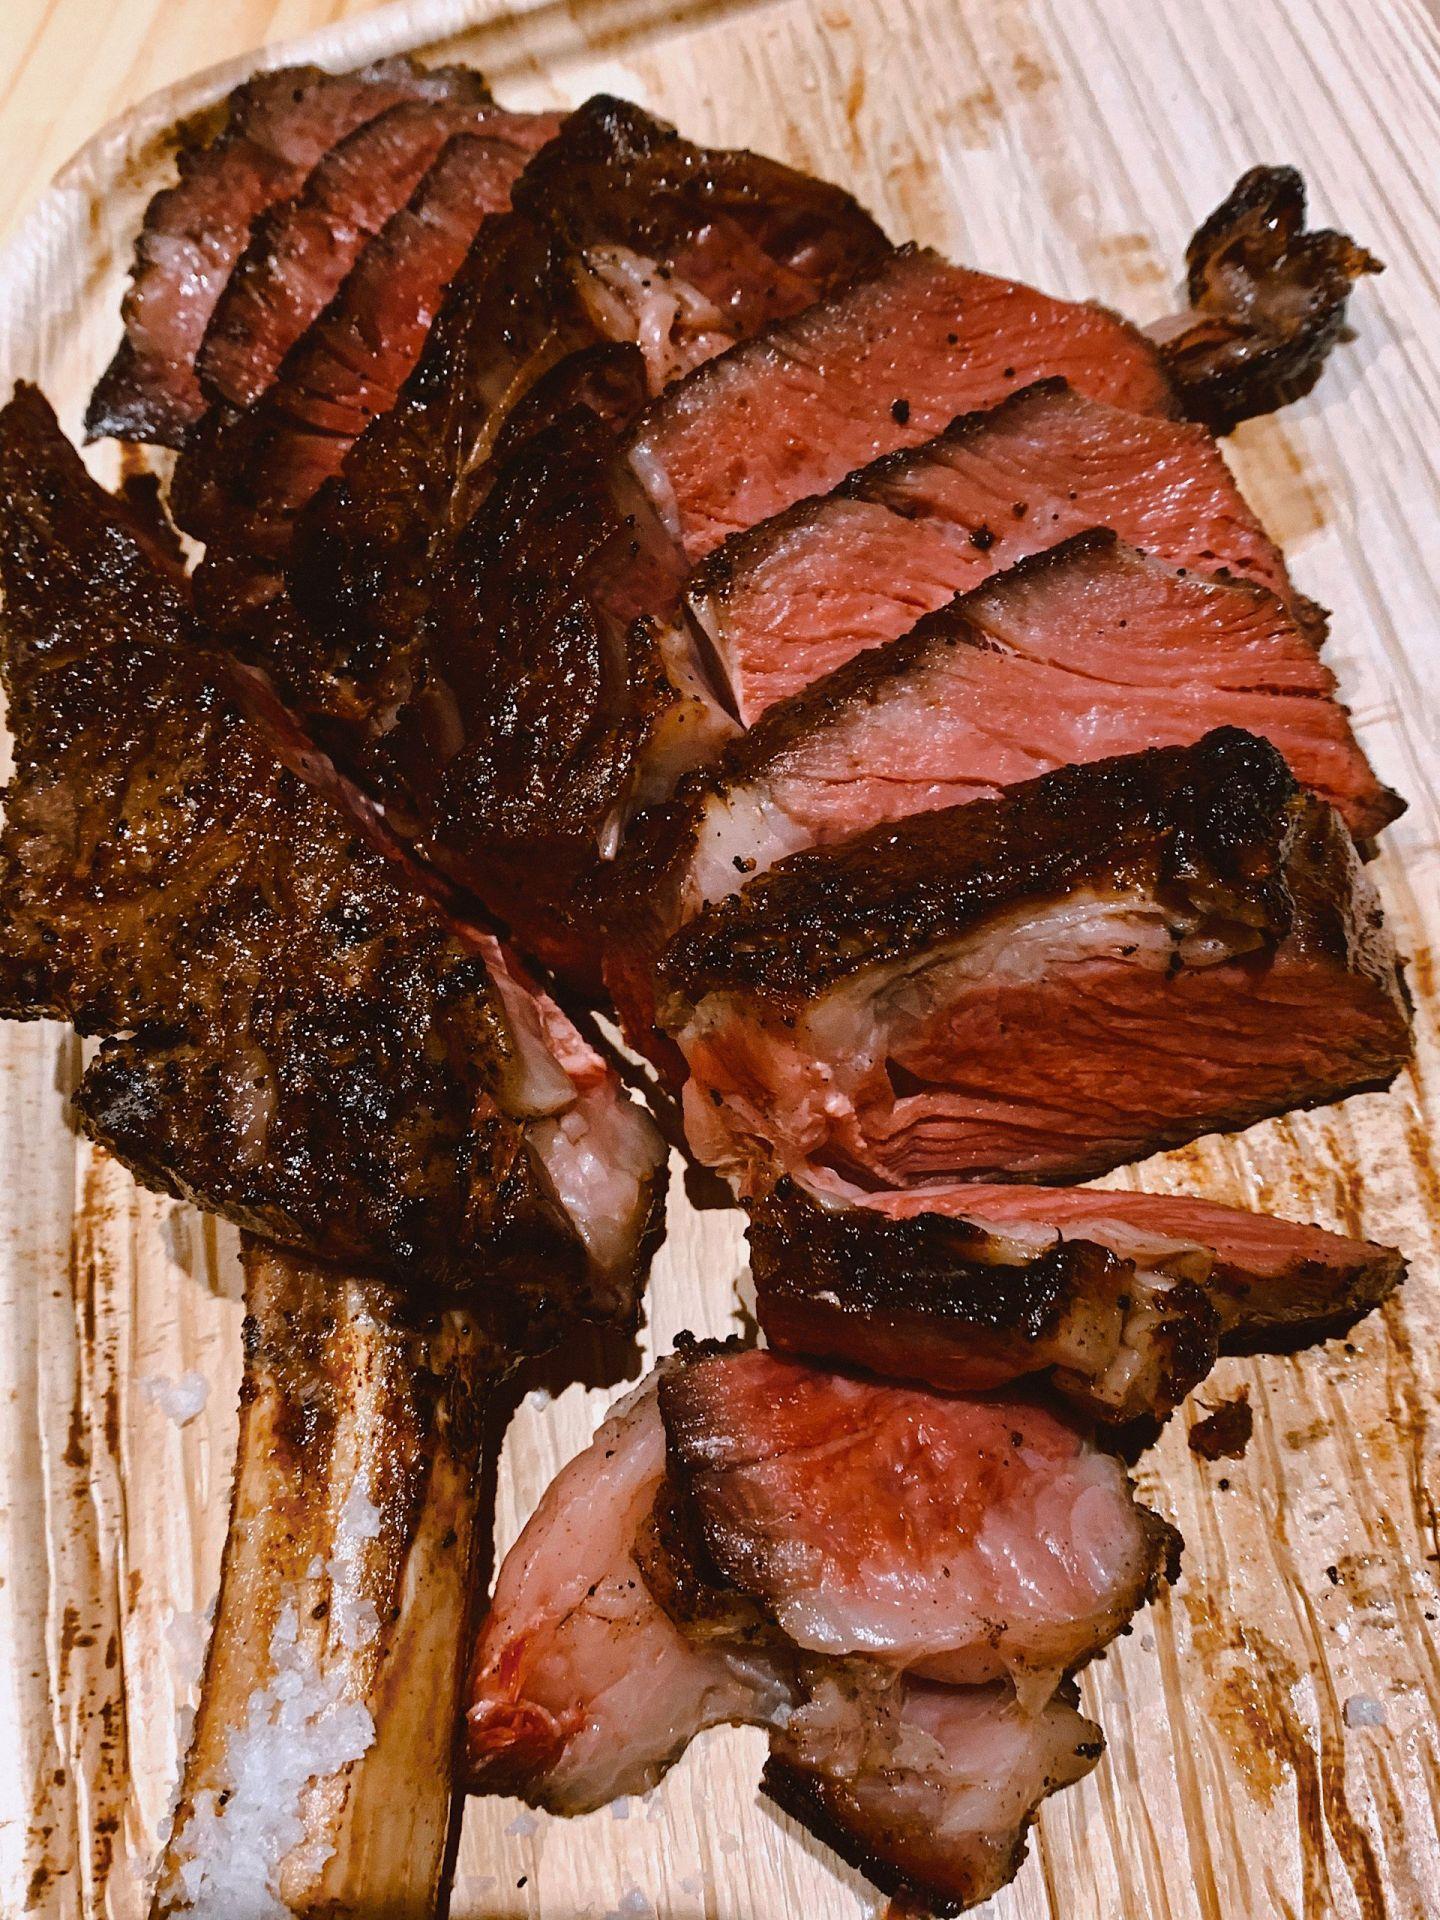 40 oz creek stone steak